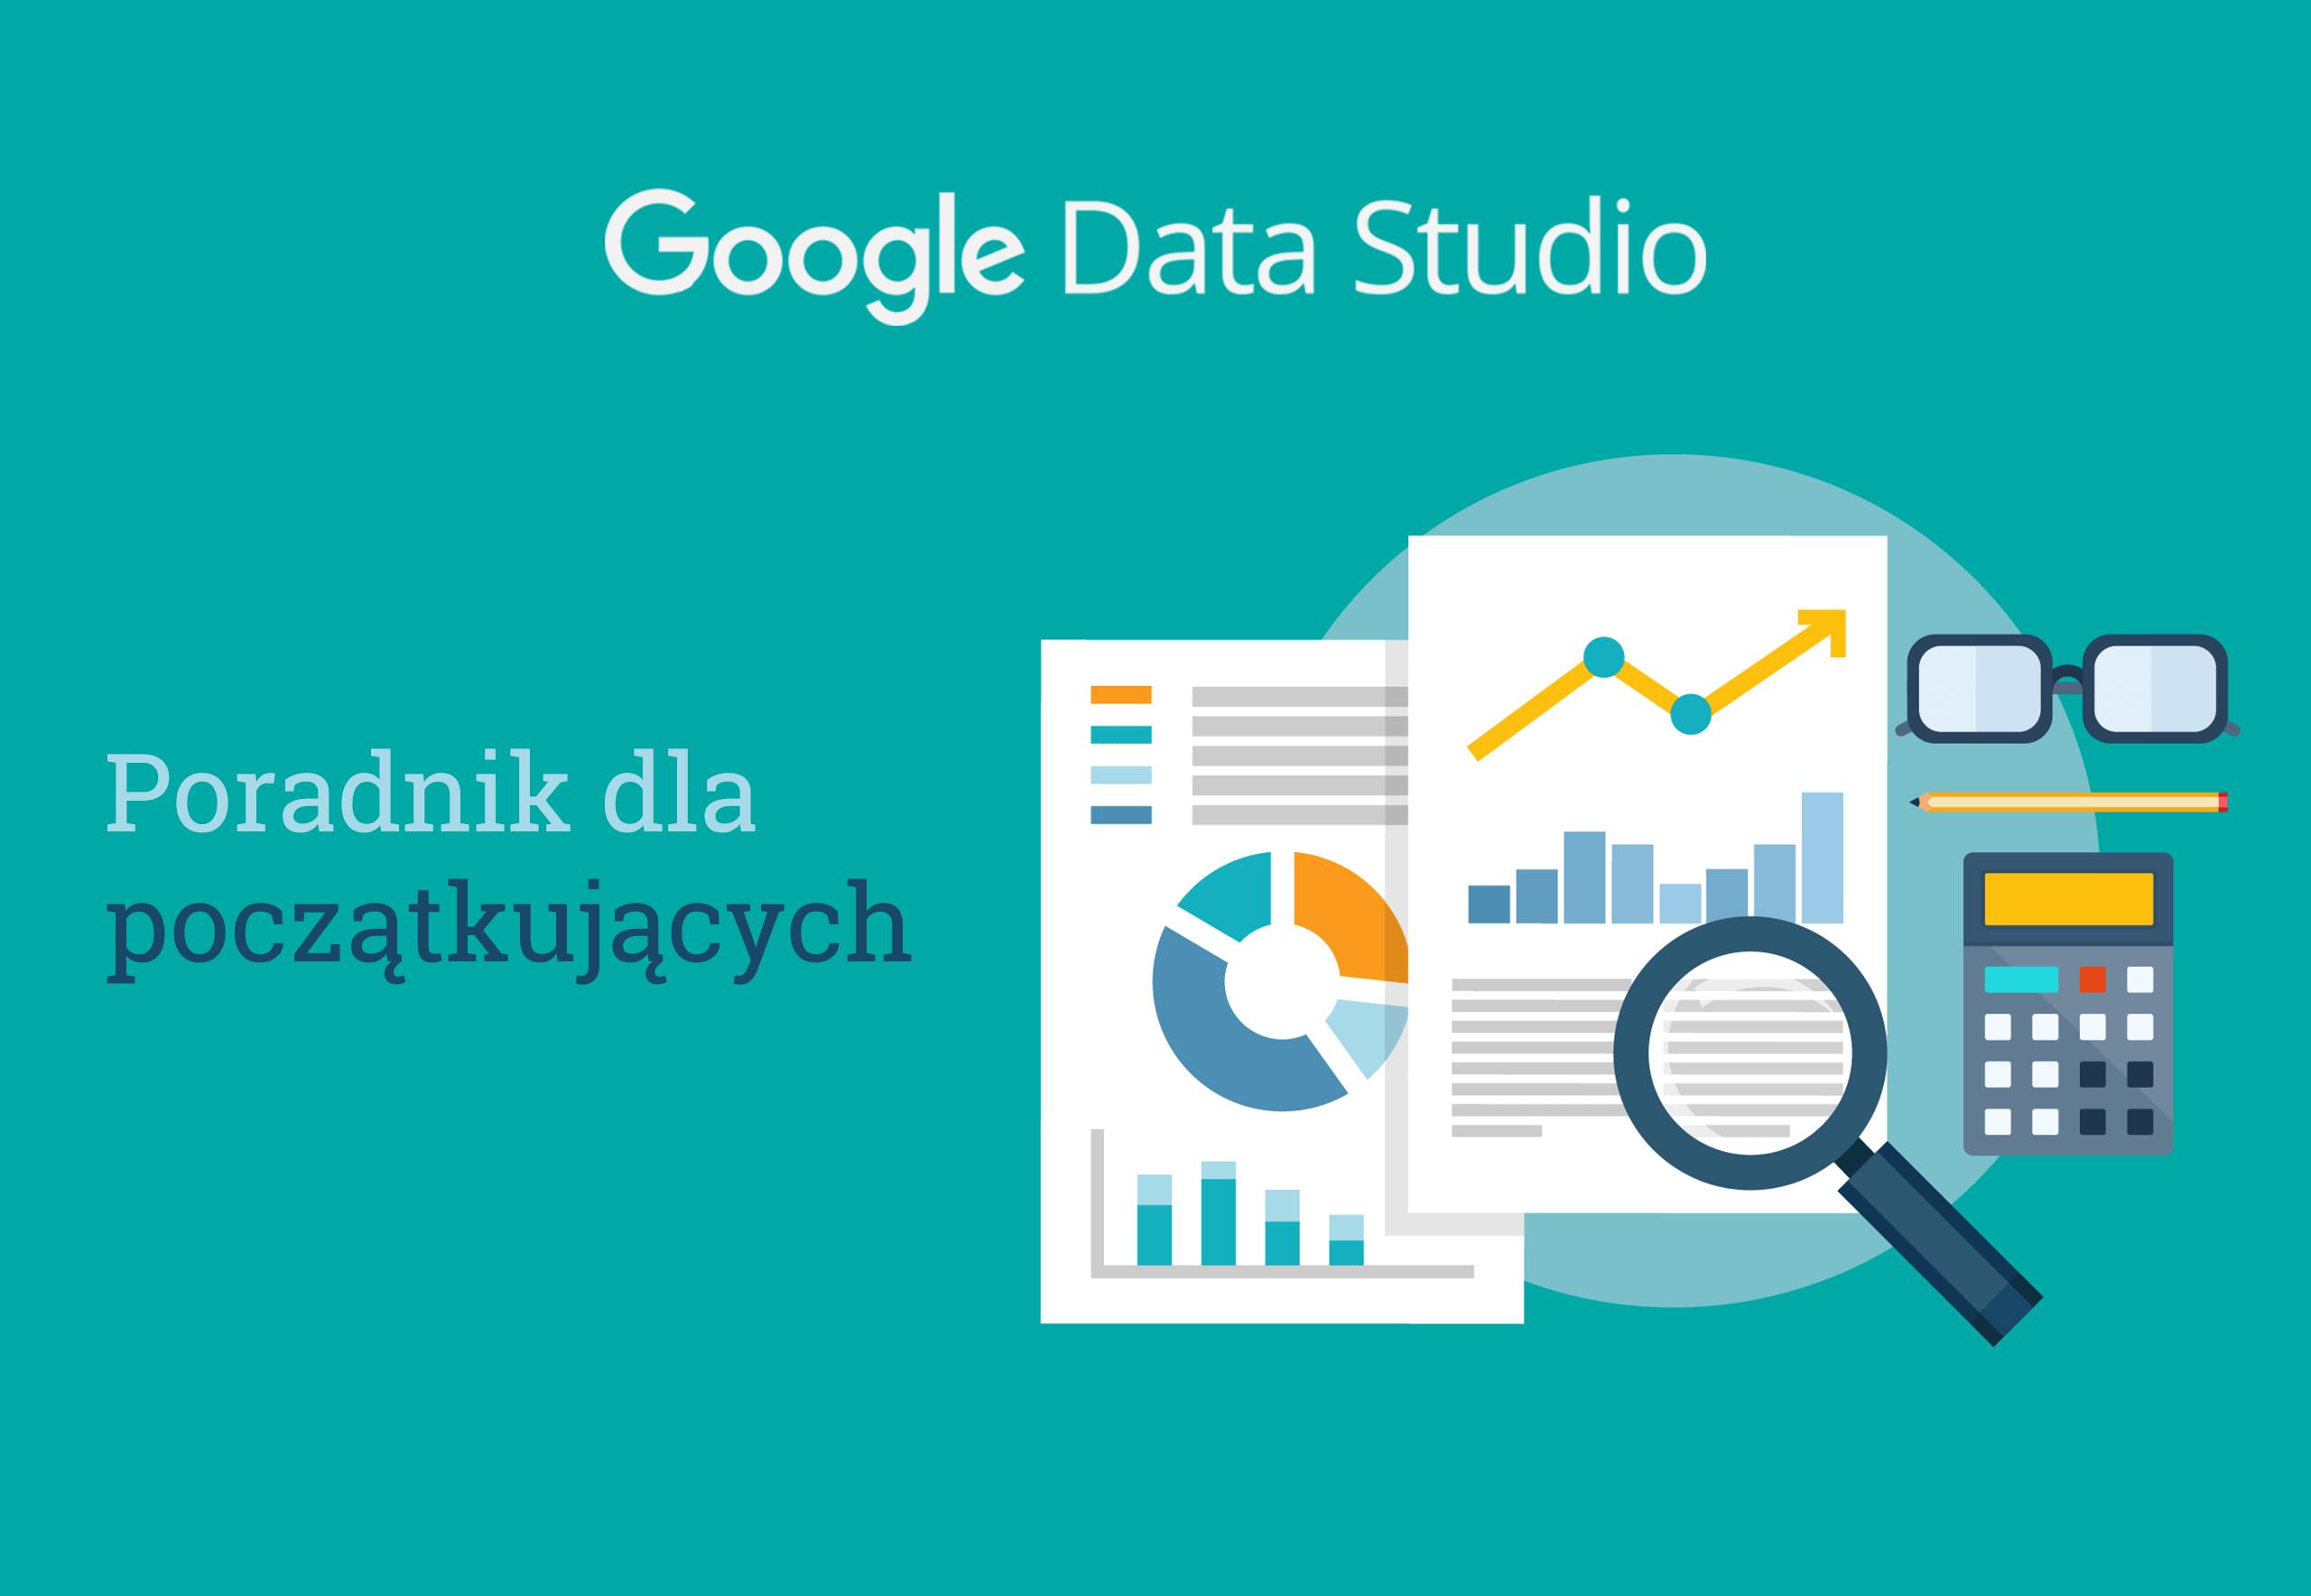 Poradnik Google Data Studio